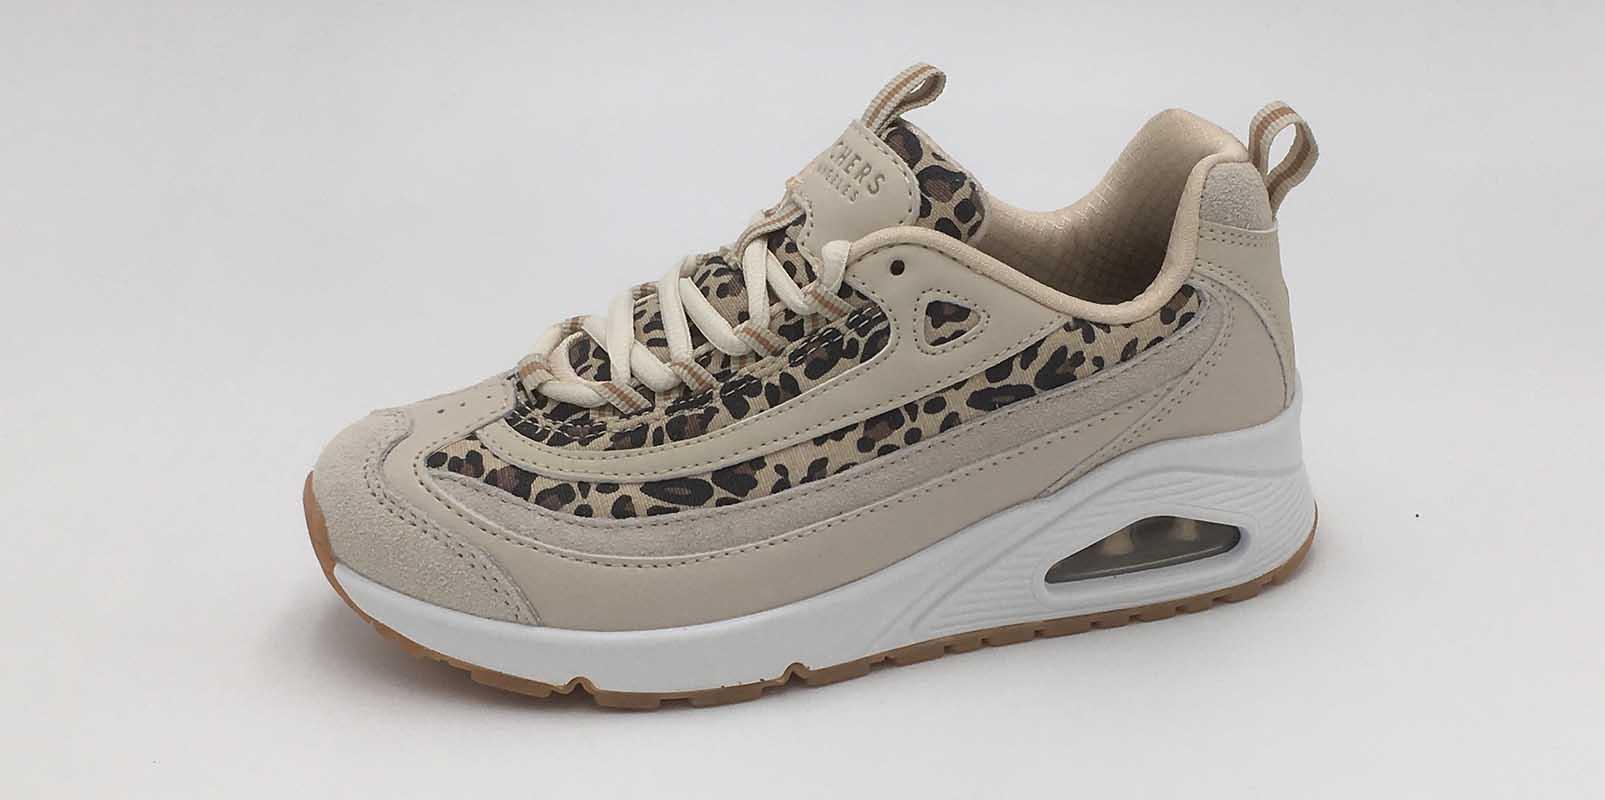 Sneakers-Skechers-Cuir-Beige-Sport-City-Annecy-Mode